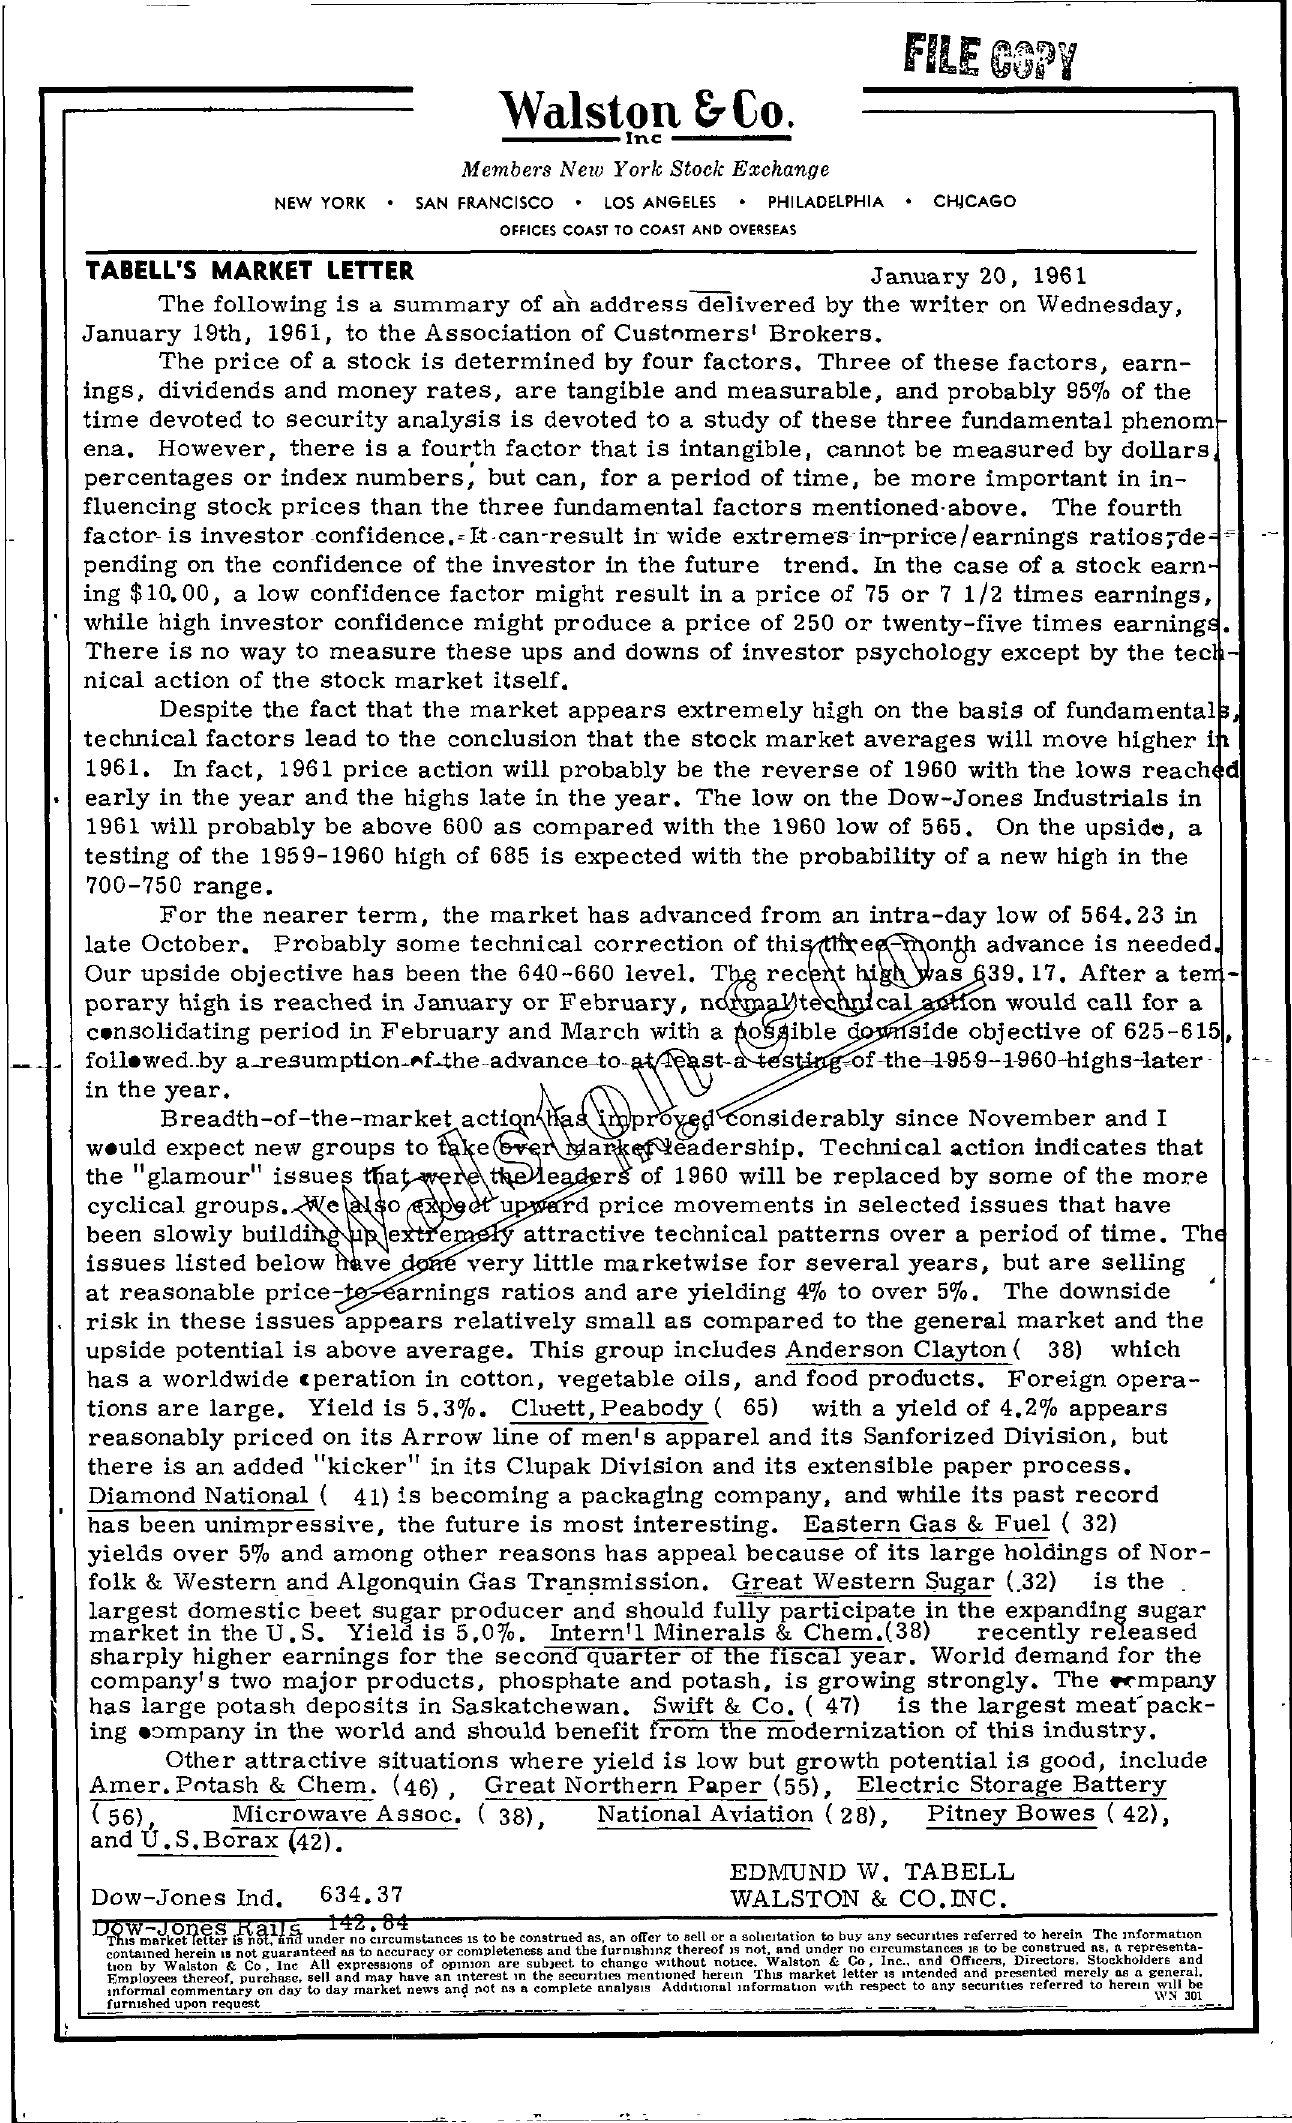 Tabell's Market Letter - January 20, 1961